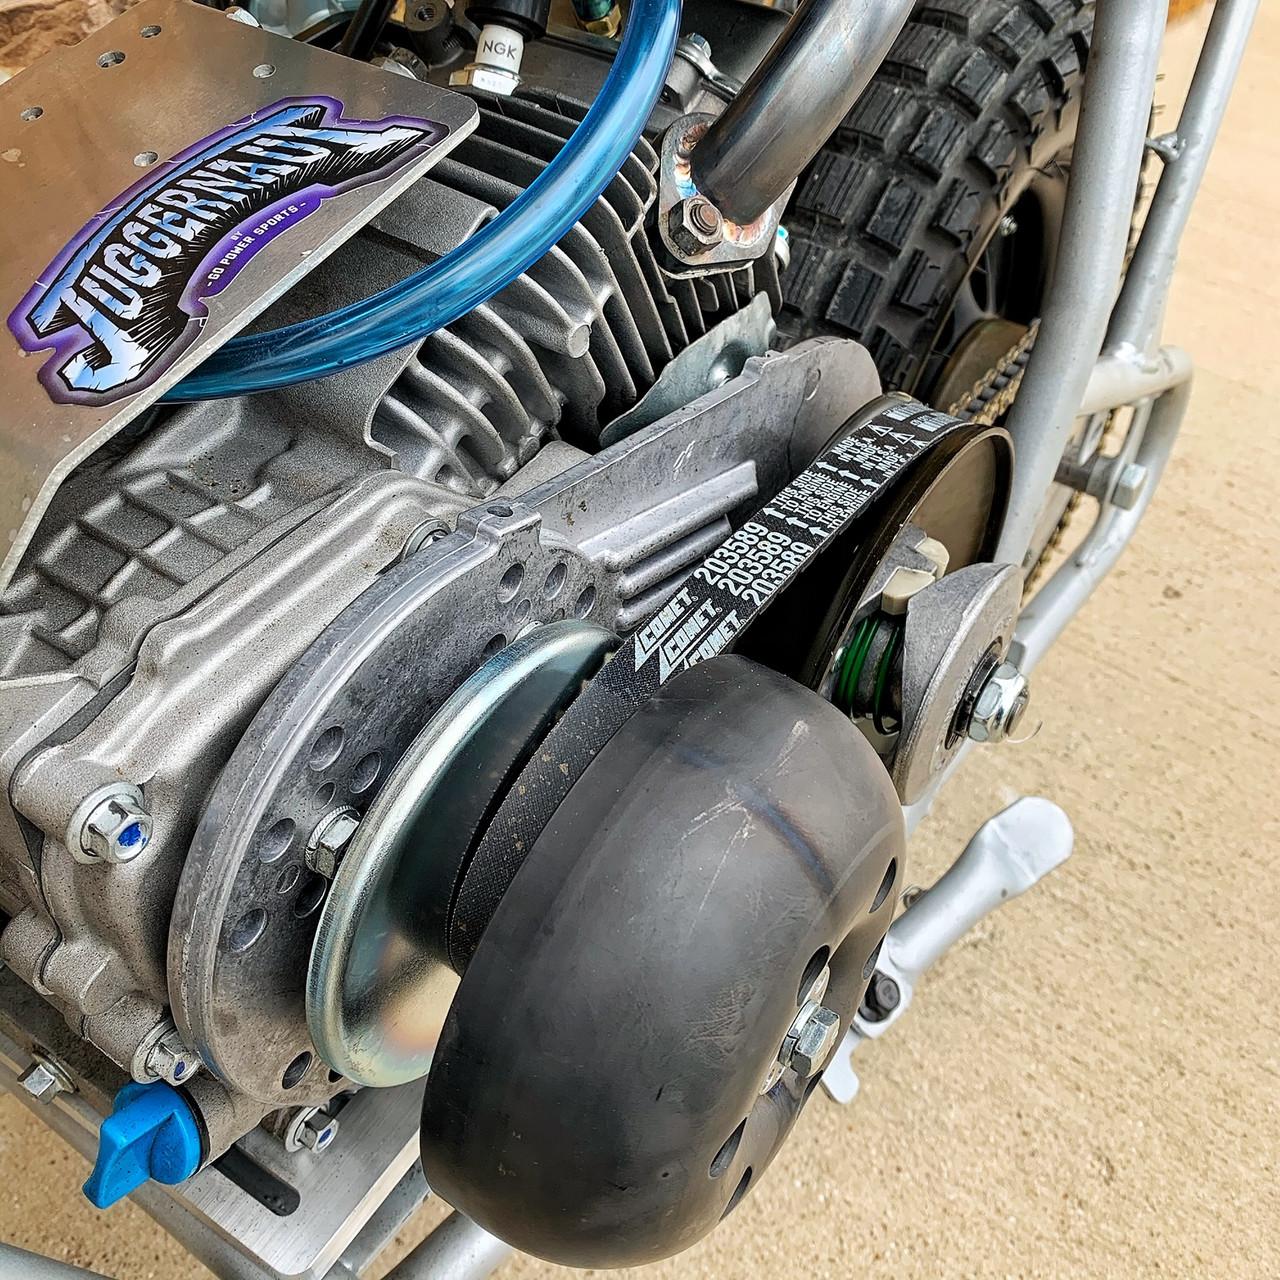 Super 30 Series Driver - The Juggernaut